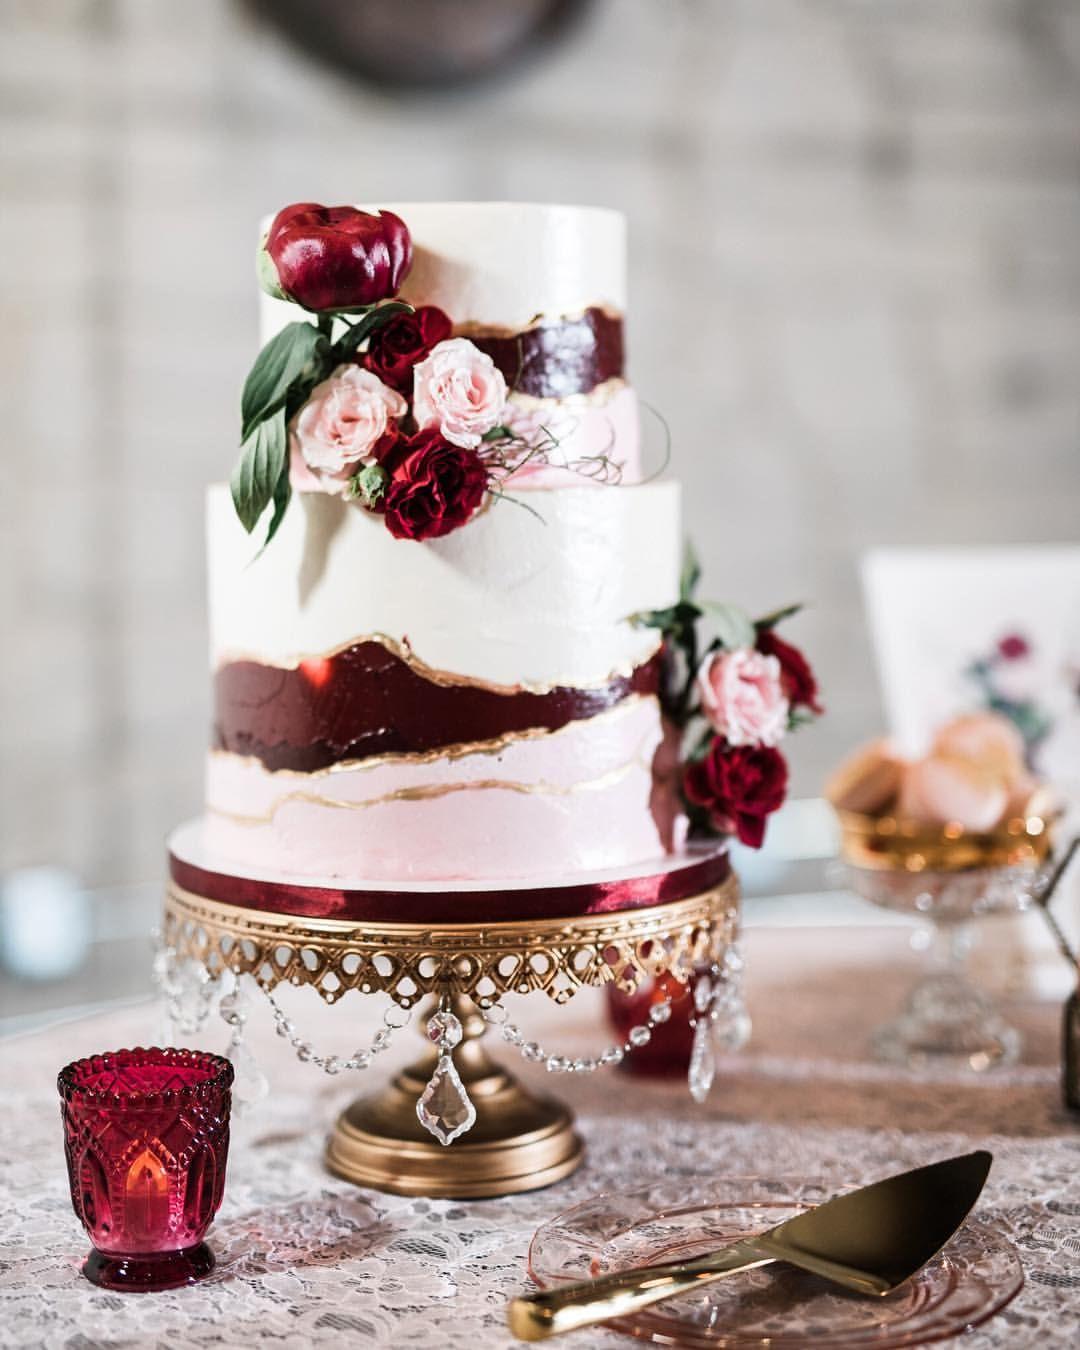 Romantic Burgundy Blush Wedding Cake On Our Original Chandeliercakestand By Thenoblecaker Blush Wedding Cakes Types Of Wedding Cakes Burgundy Wedding Cake